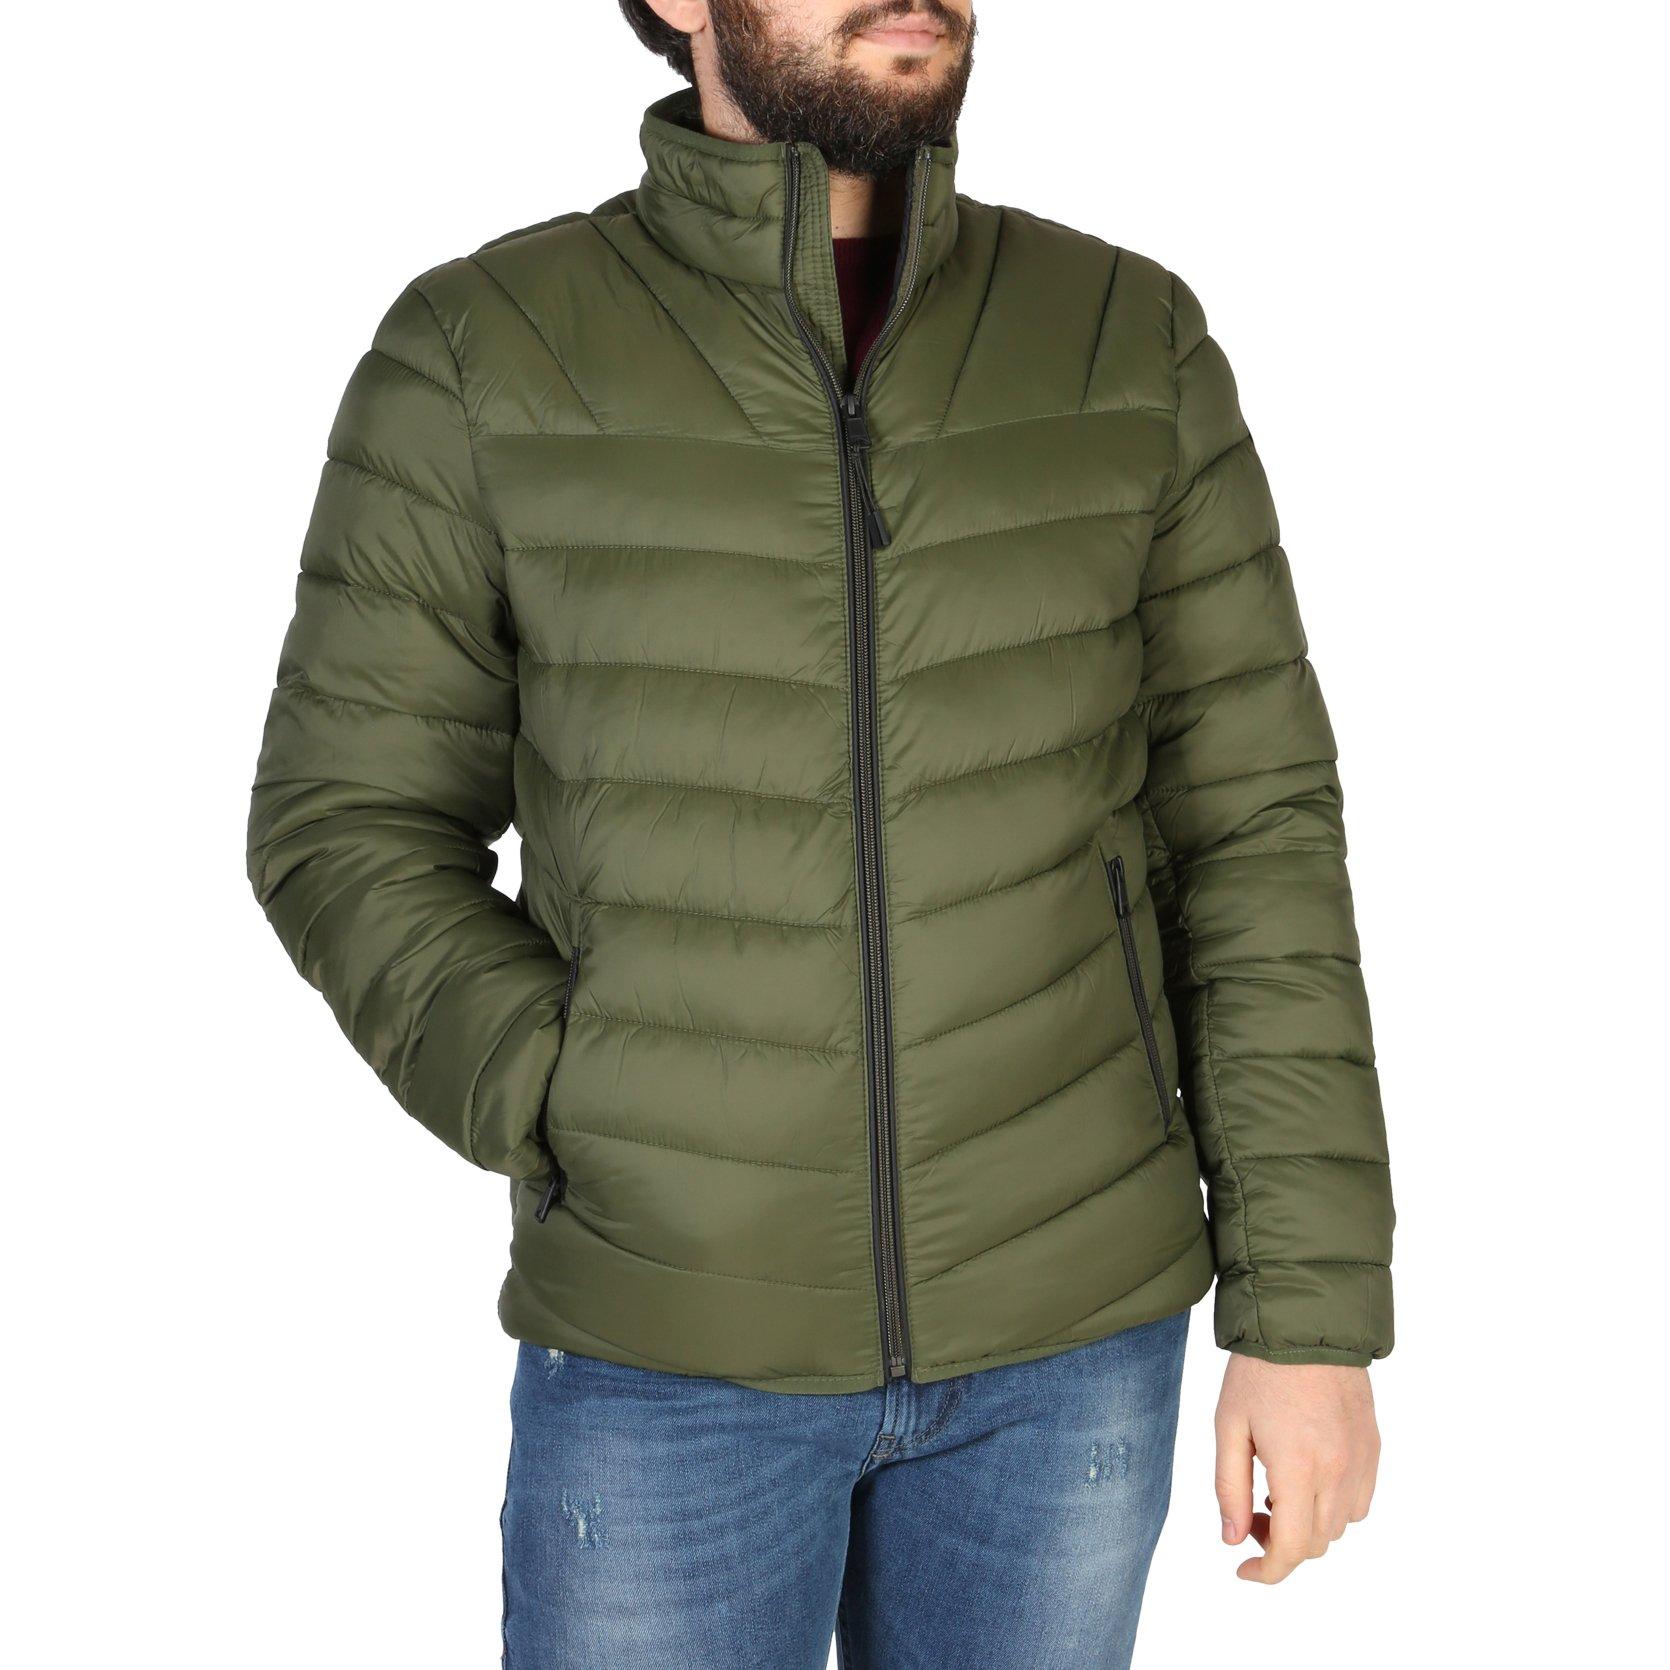 Napapijri Men's Jacket Various Colours NP0A4ENM - green S